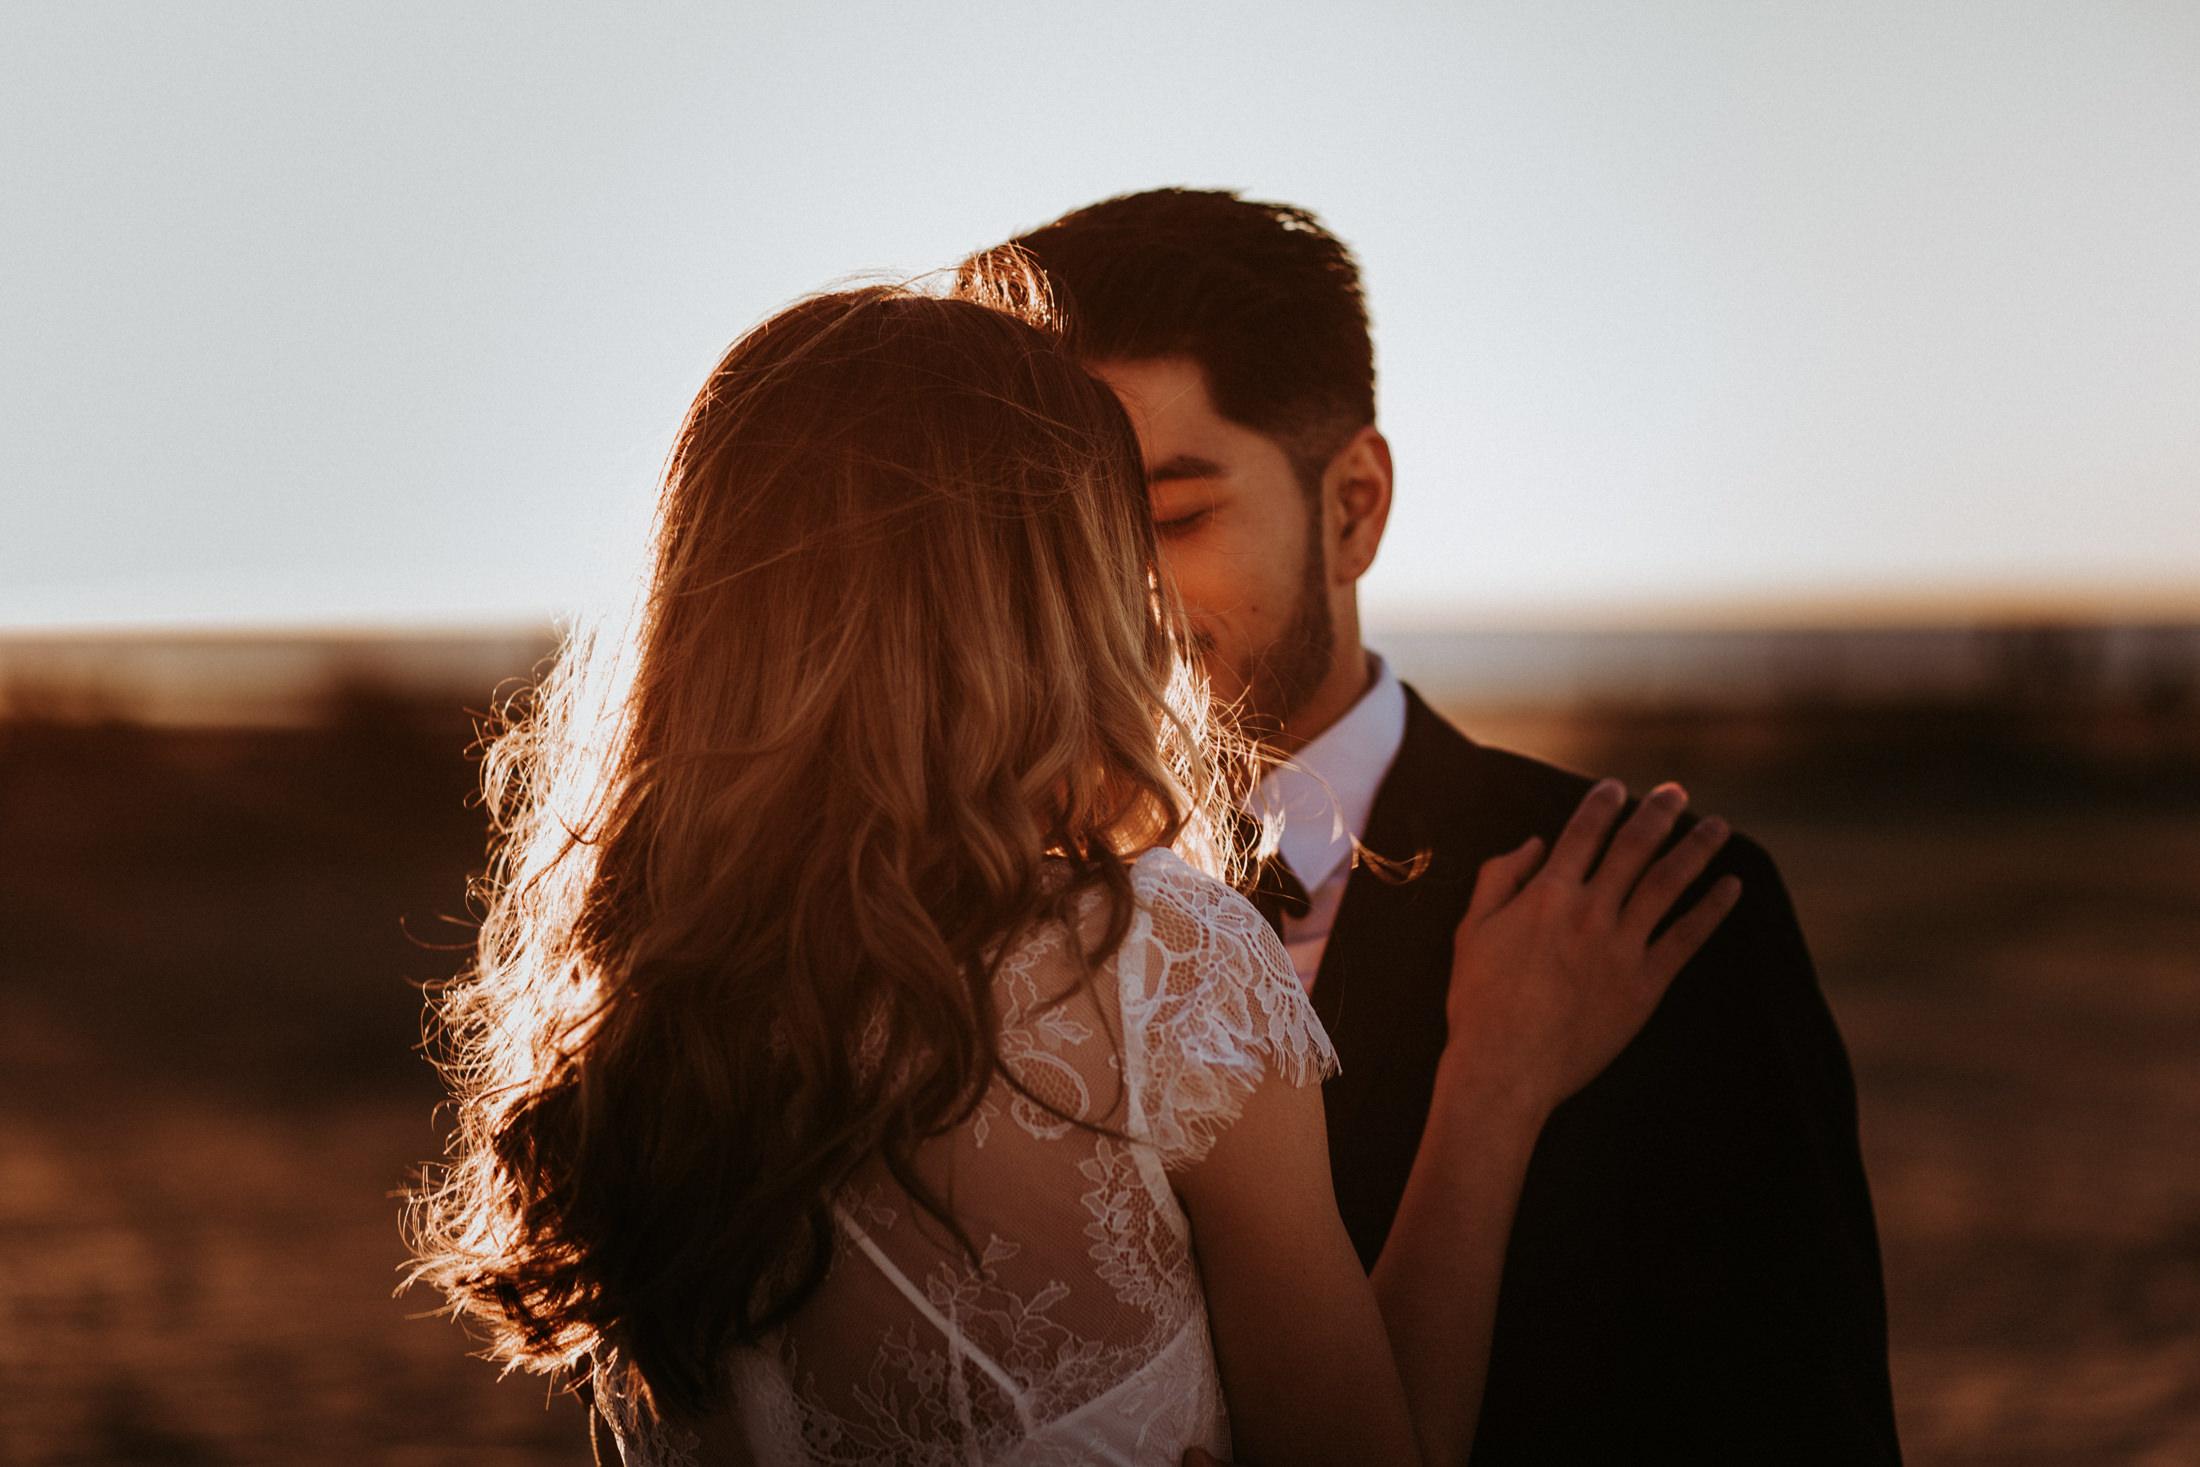 Wedding_Photographer_Mallorca_Daniela-Marquardt_Photography_CanaryIslands_Lanzarote_Iceland_Tuskany_Santorini_Portugal_Schweiz_Austria_Bayern_Elopement_Hochzeitsfotograf_Norddeichich_64